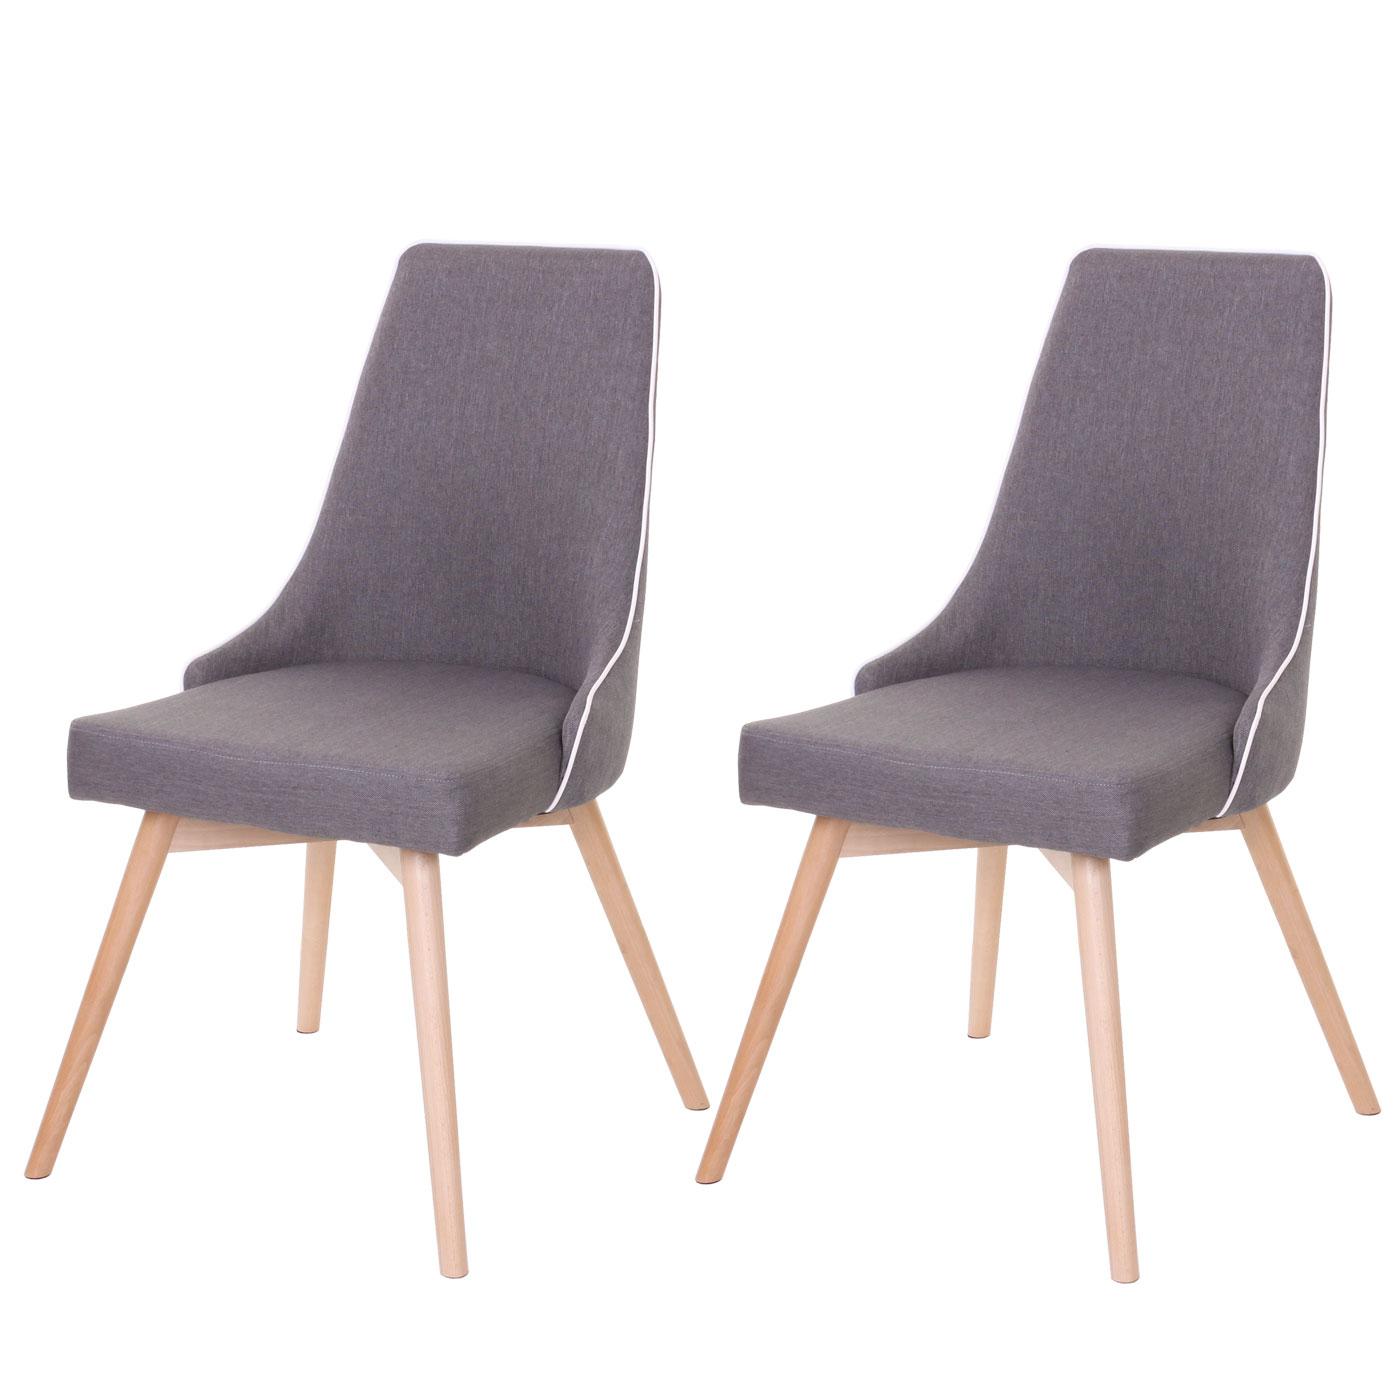 2x esszimmerstuhl hwc b44 stuhl lehnstuhl retro 50er jahre design textil dunkelgrau. Black Bedroom Furniture Sets. Home Design Ideas